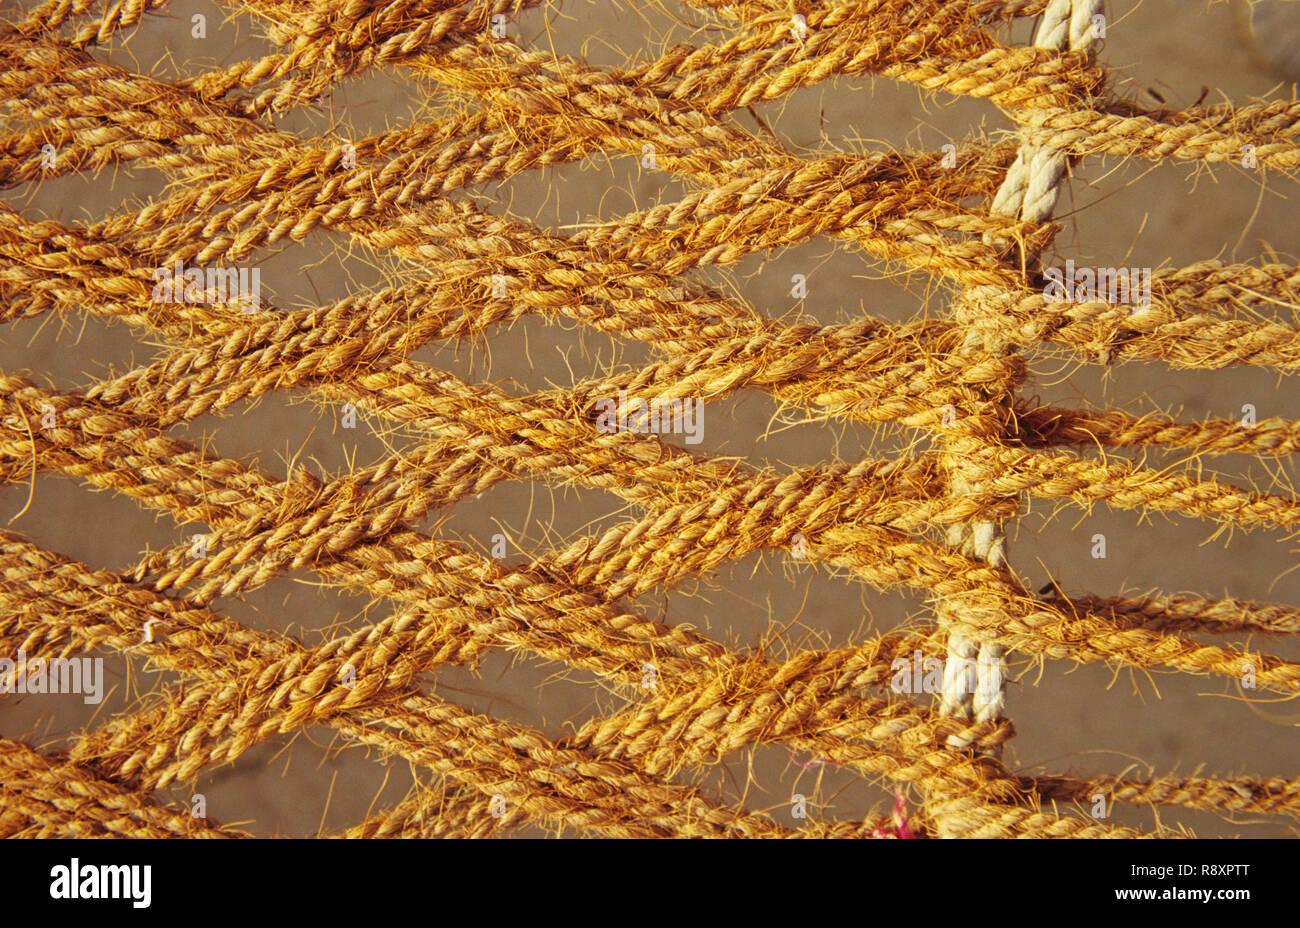 Handicrafts - Strings of Charpoy - Stock Image